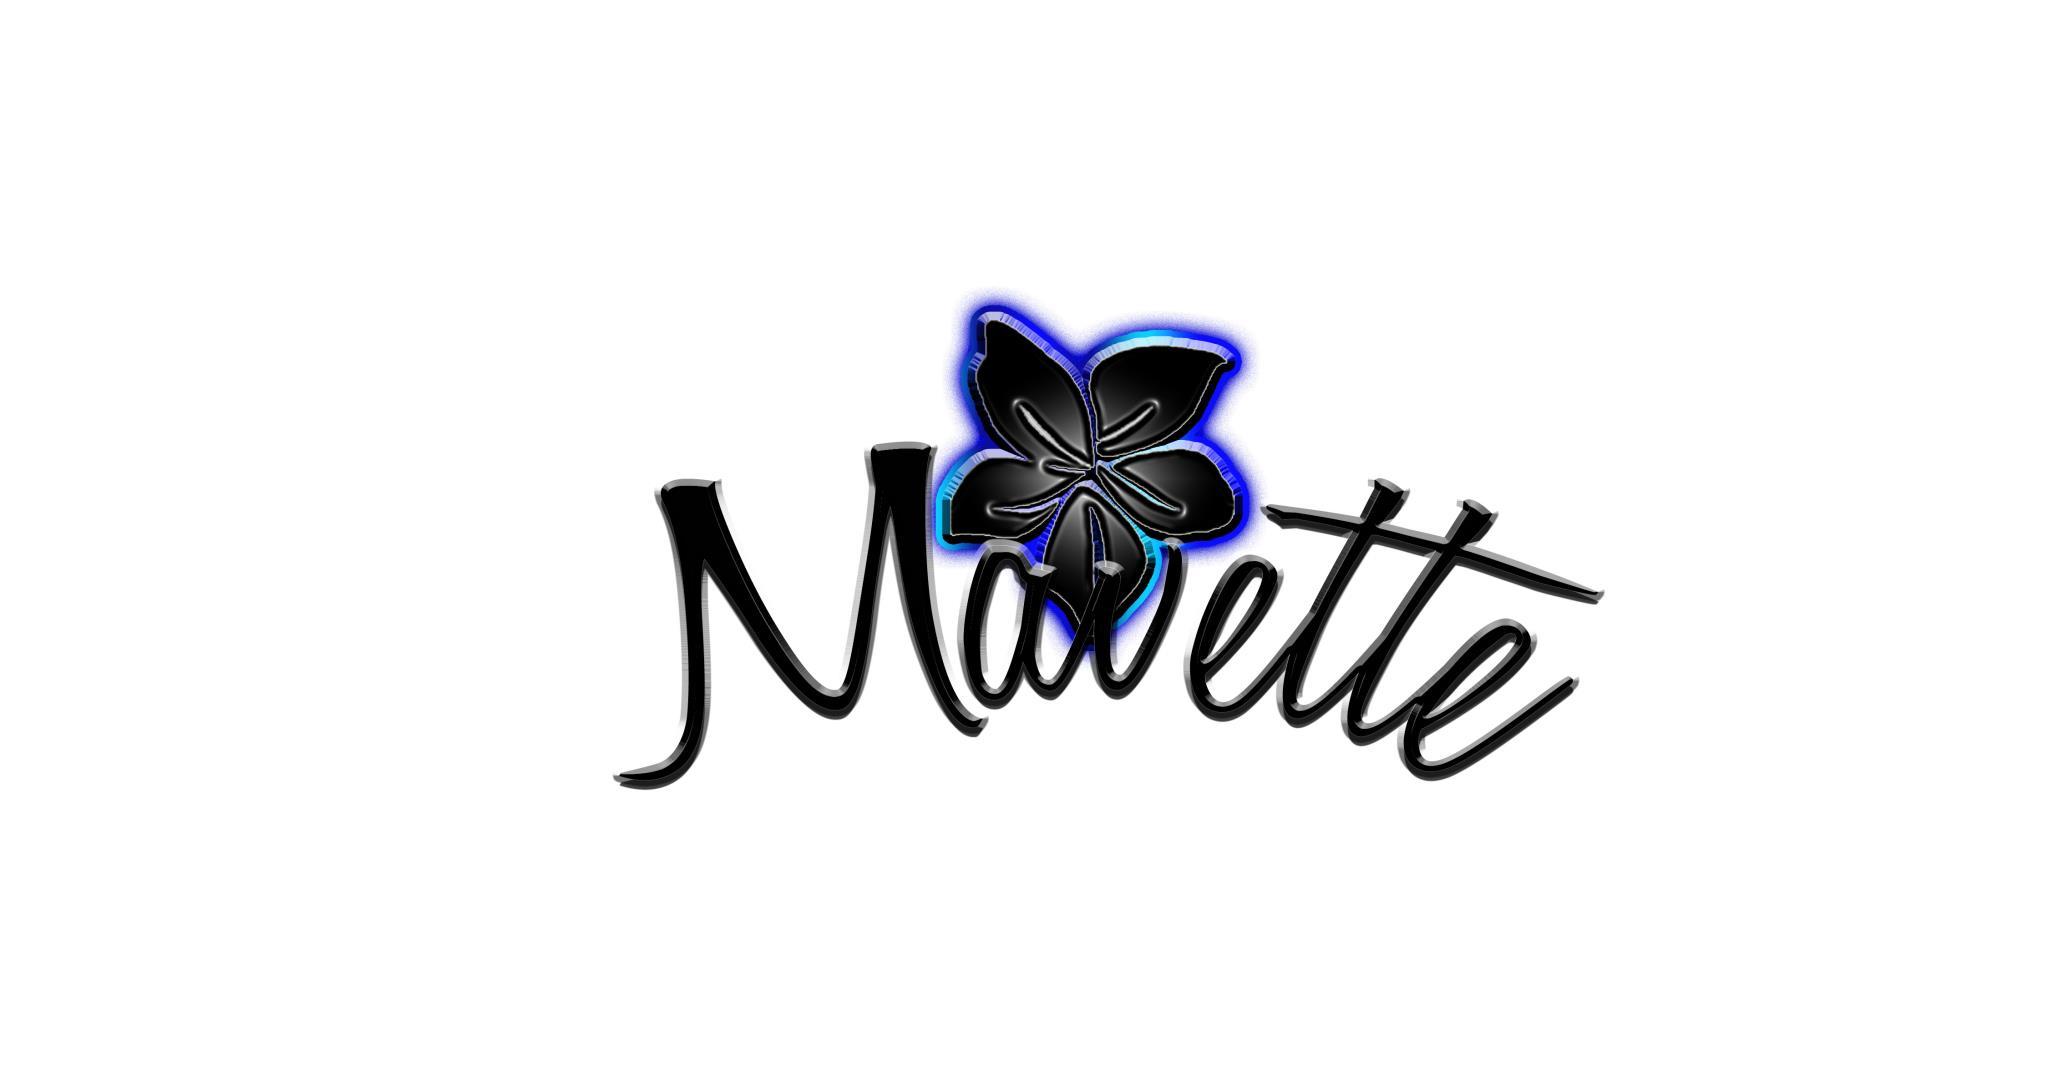 By Mavette